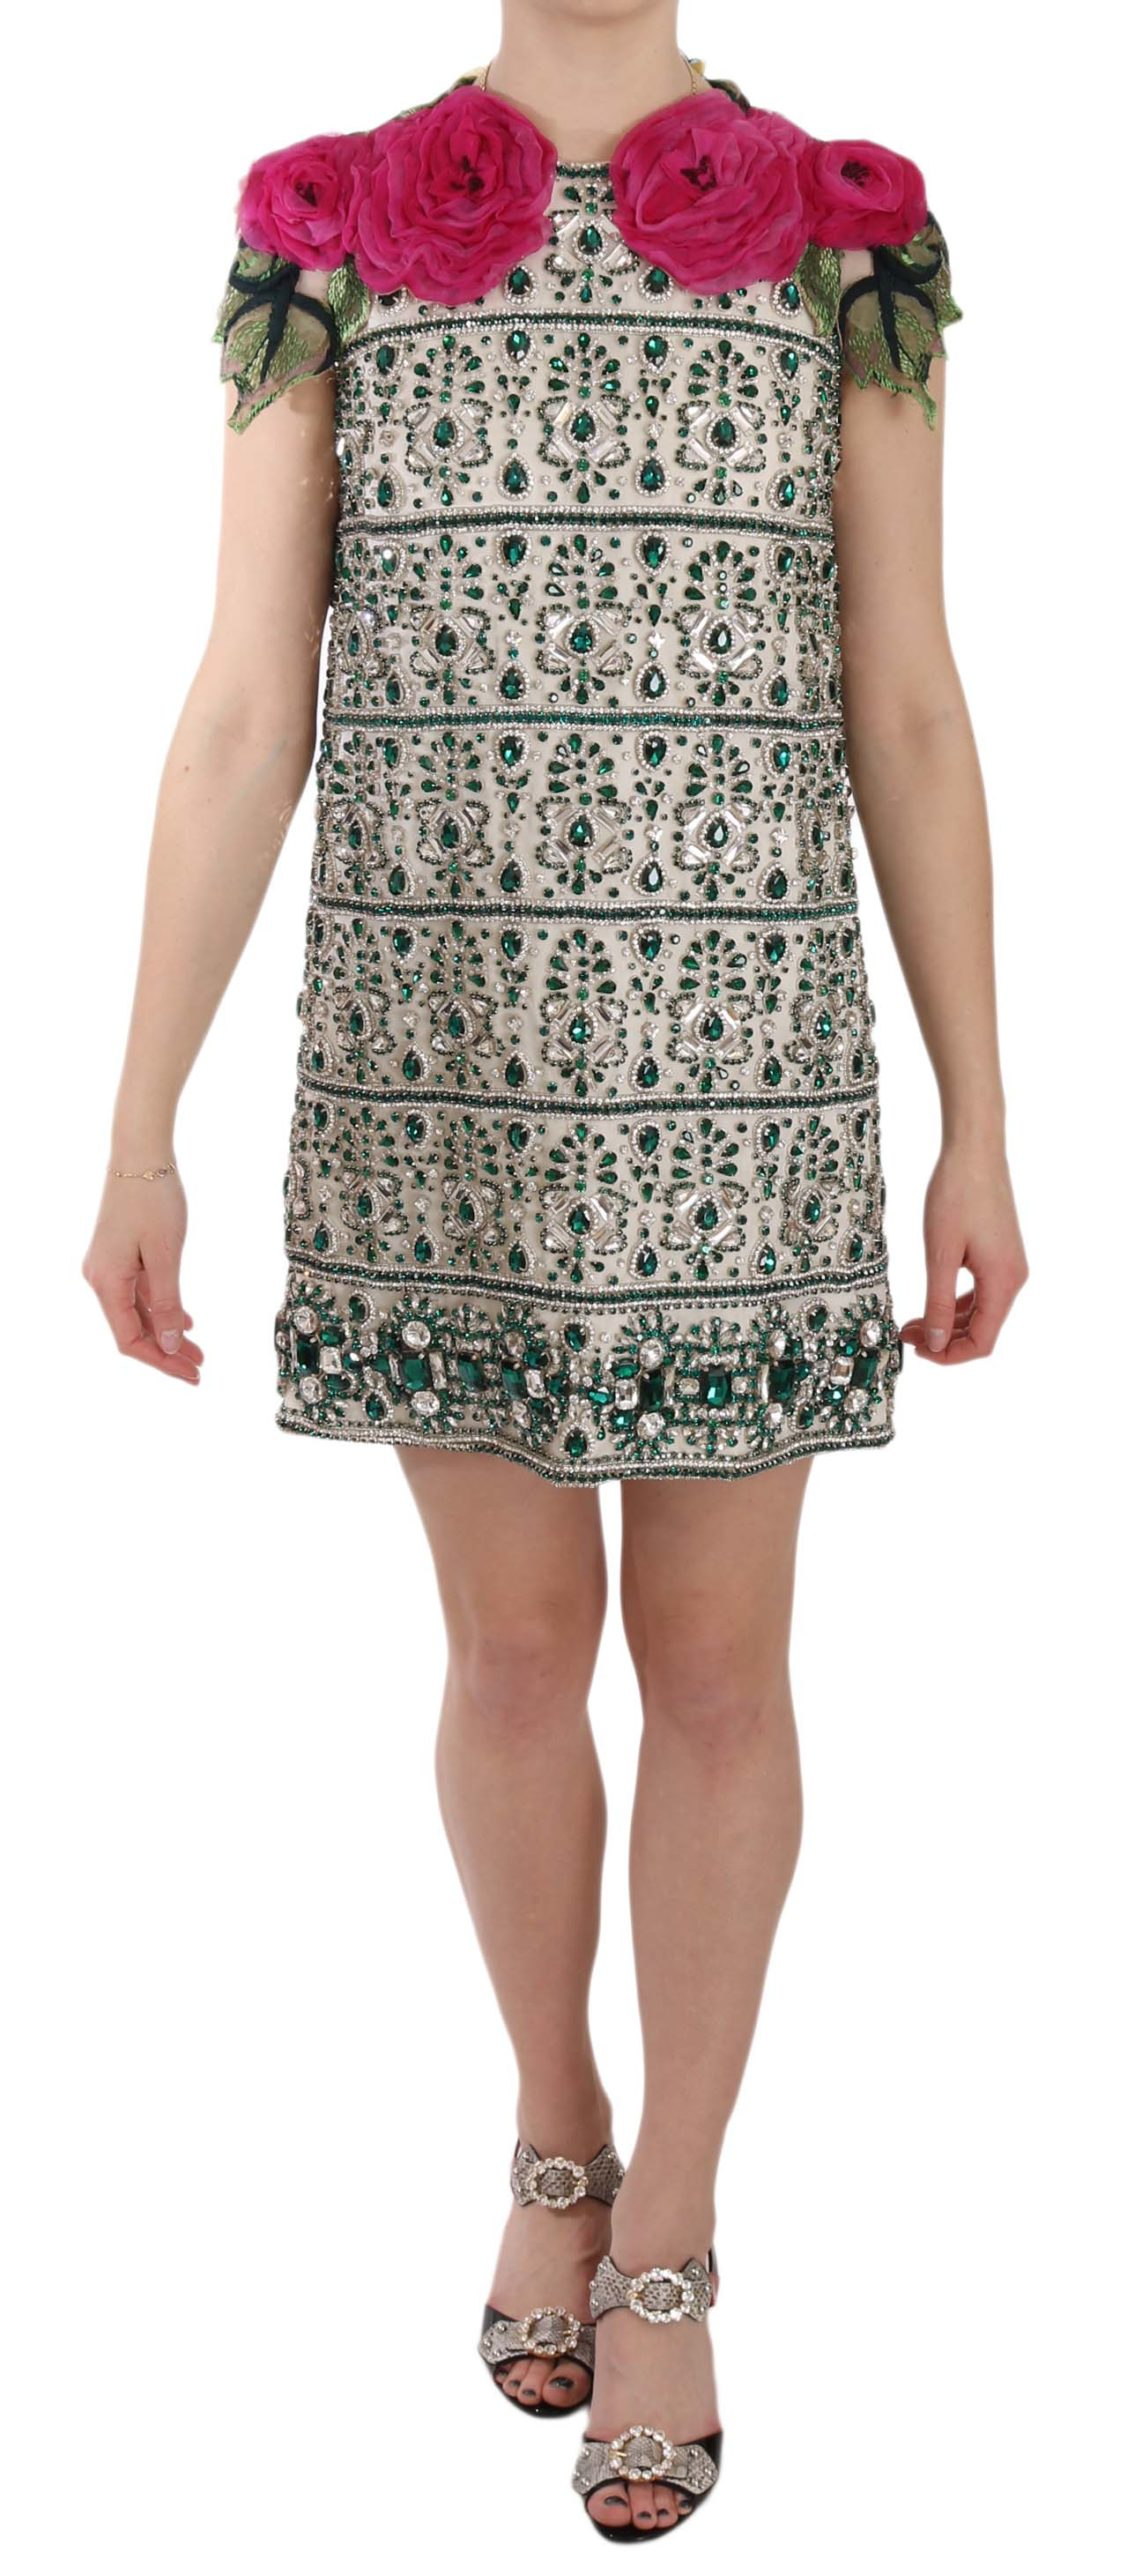 Dolce & Gabbana Women's Crystal Jewel Floral Sleeves Mini Dress Beige DR1624 - IT38 | S